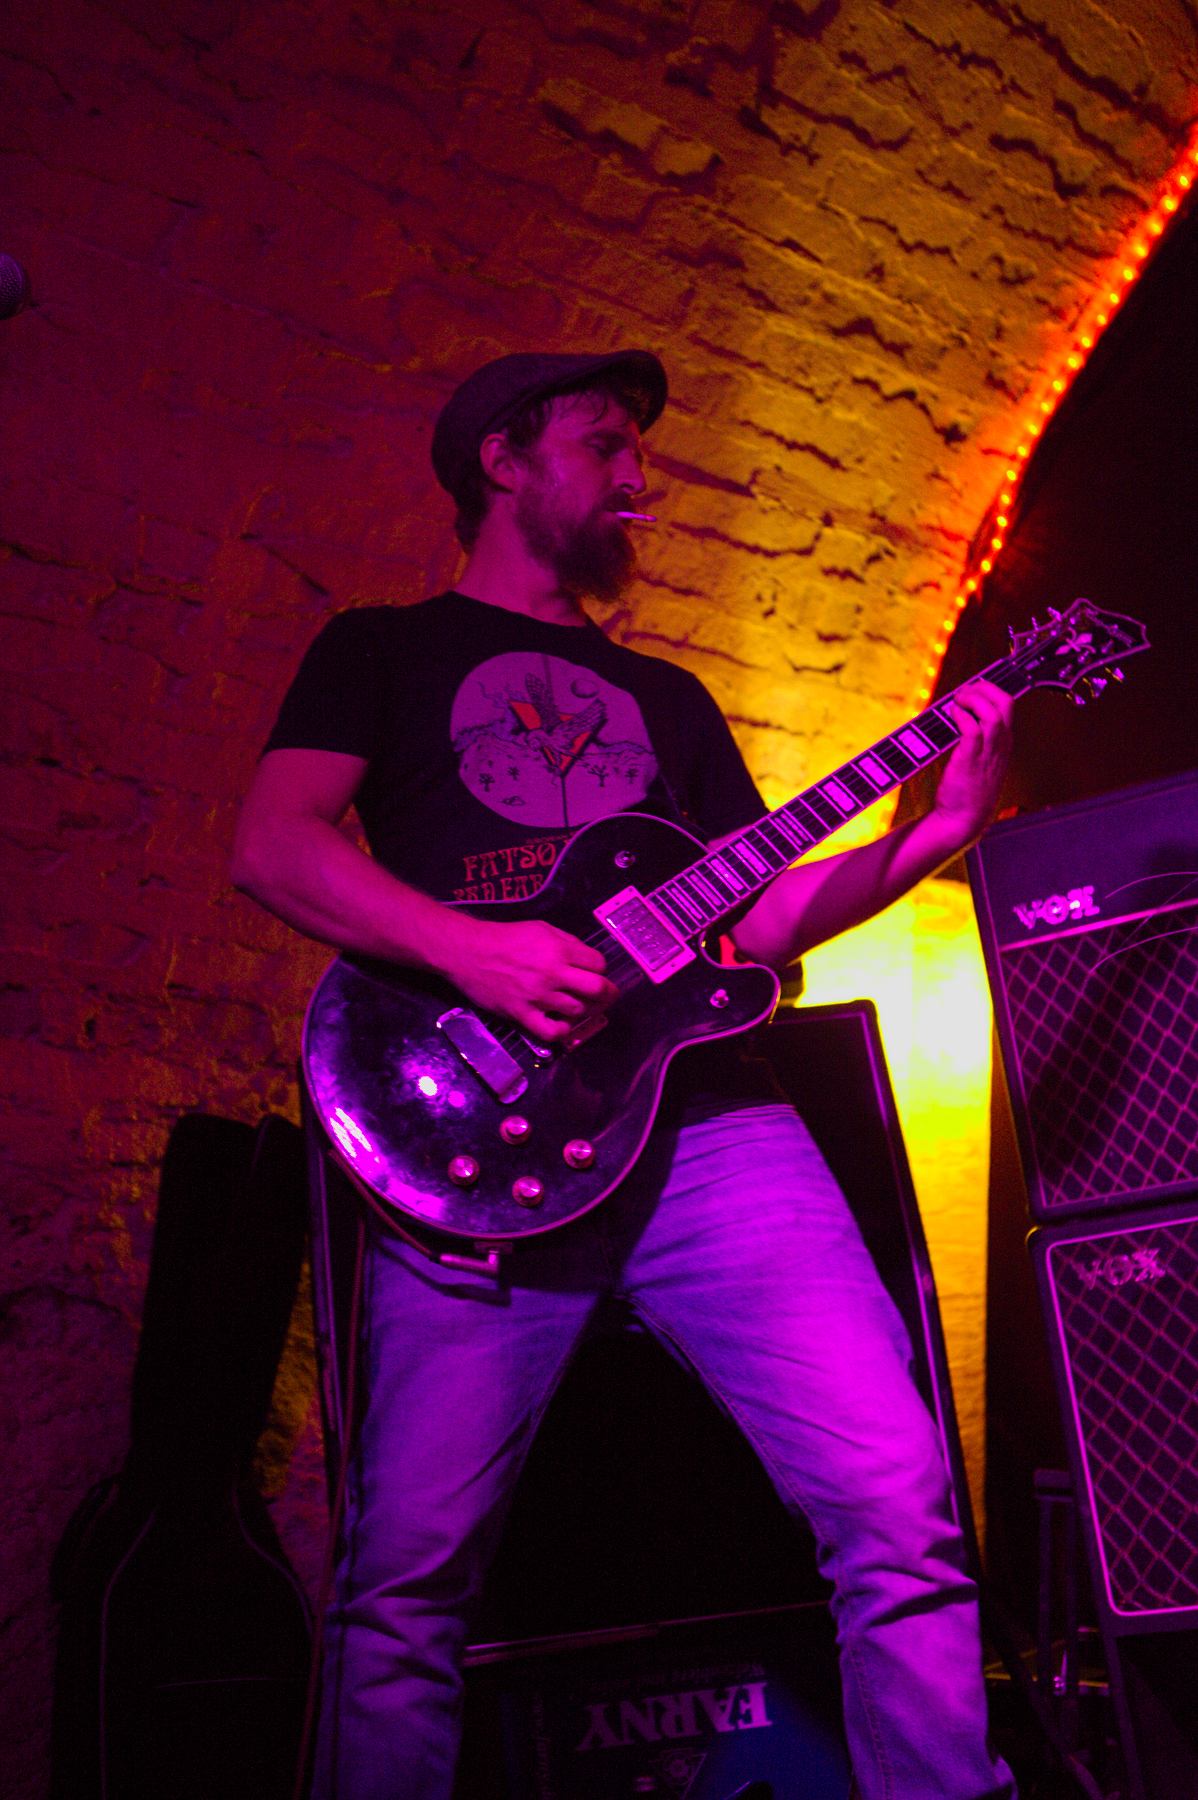 Glaus - Gitarre